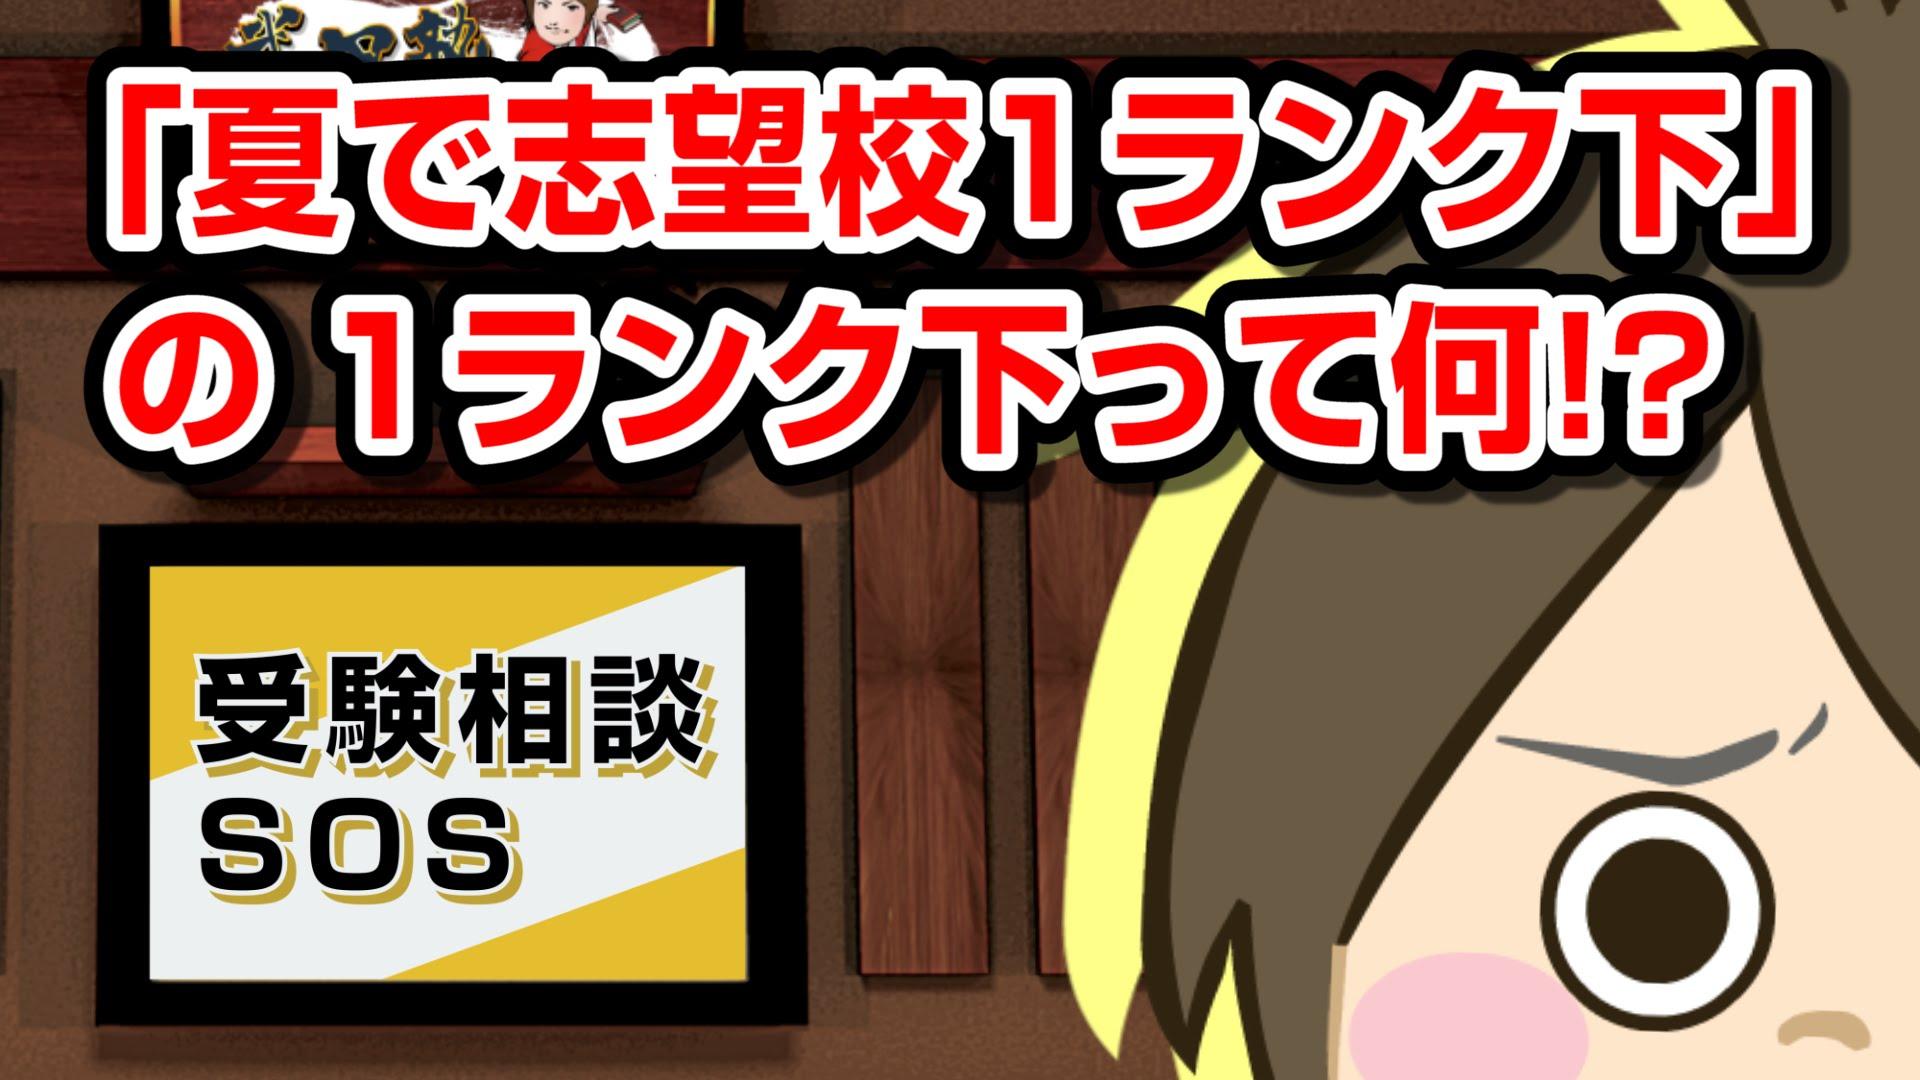 【vol.603】武田塾用語?「夏の間で志望校1ランク下!!」の1ランク下って何!?|受験相談SOS